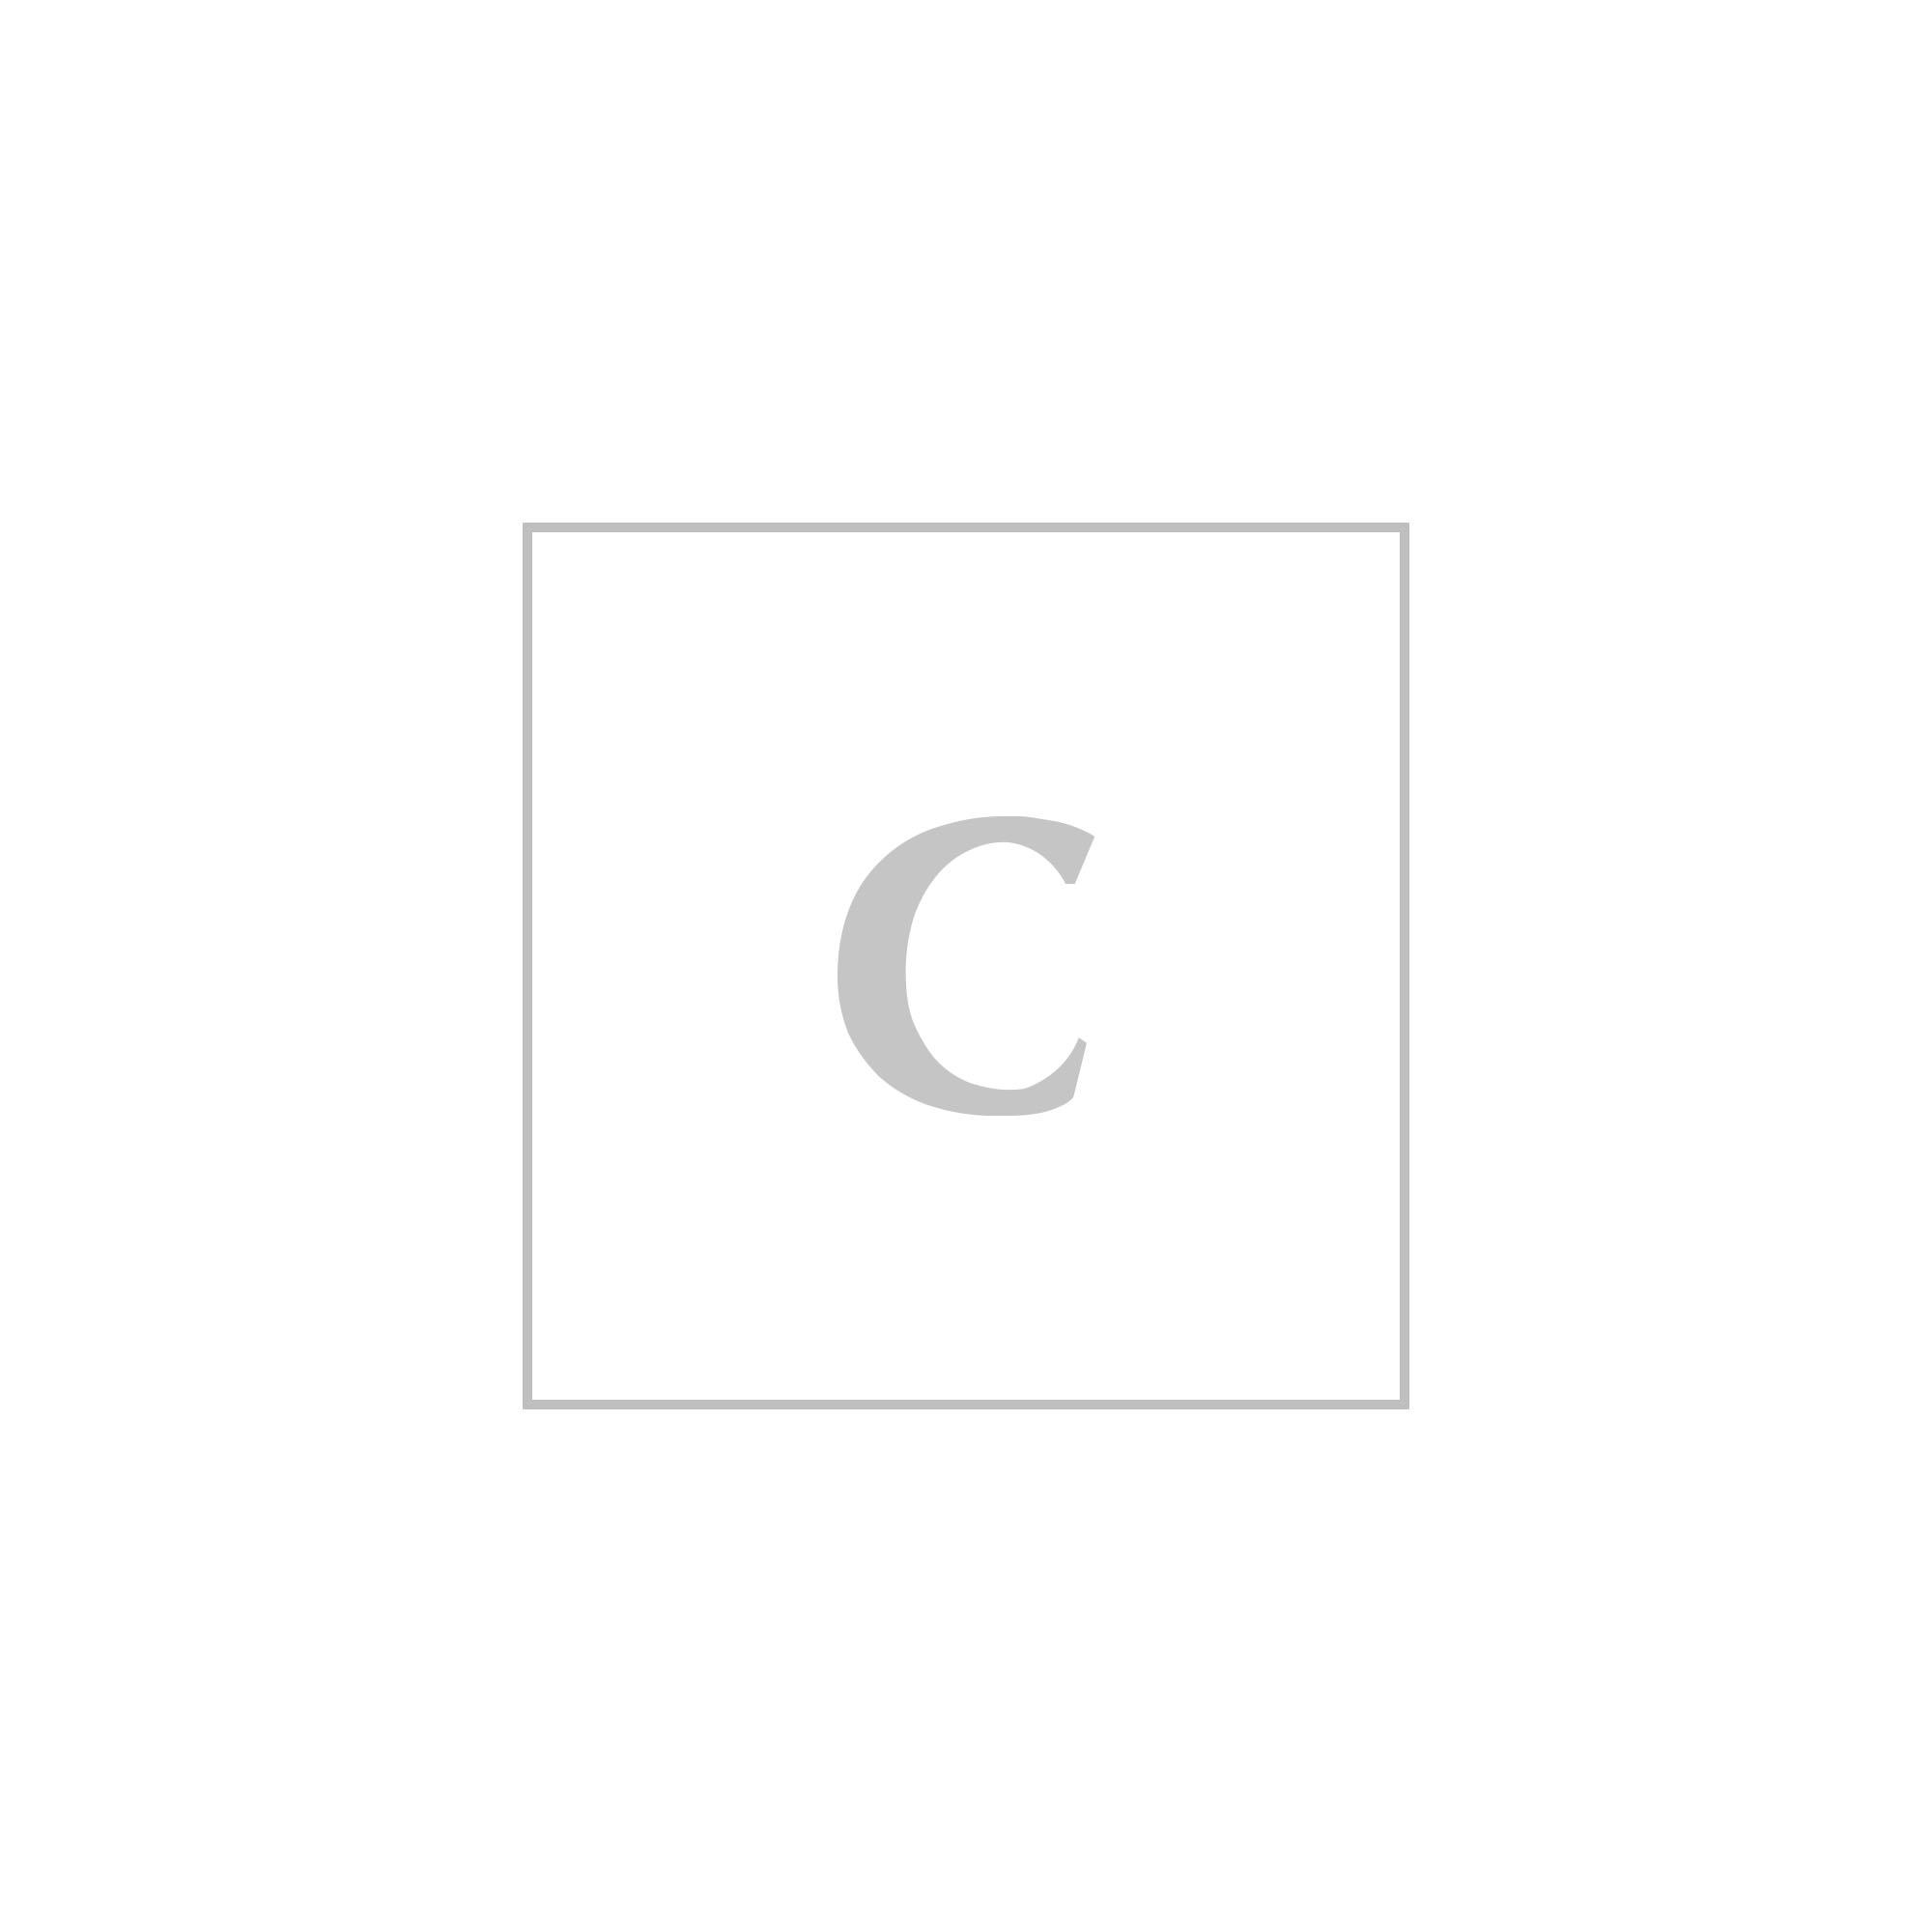 Dolce & gabbana logo mini wallet